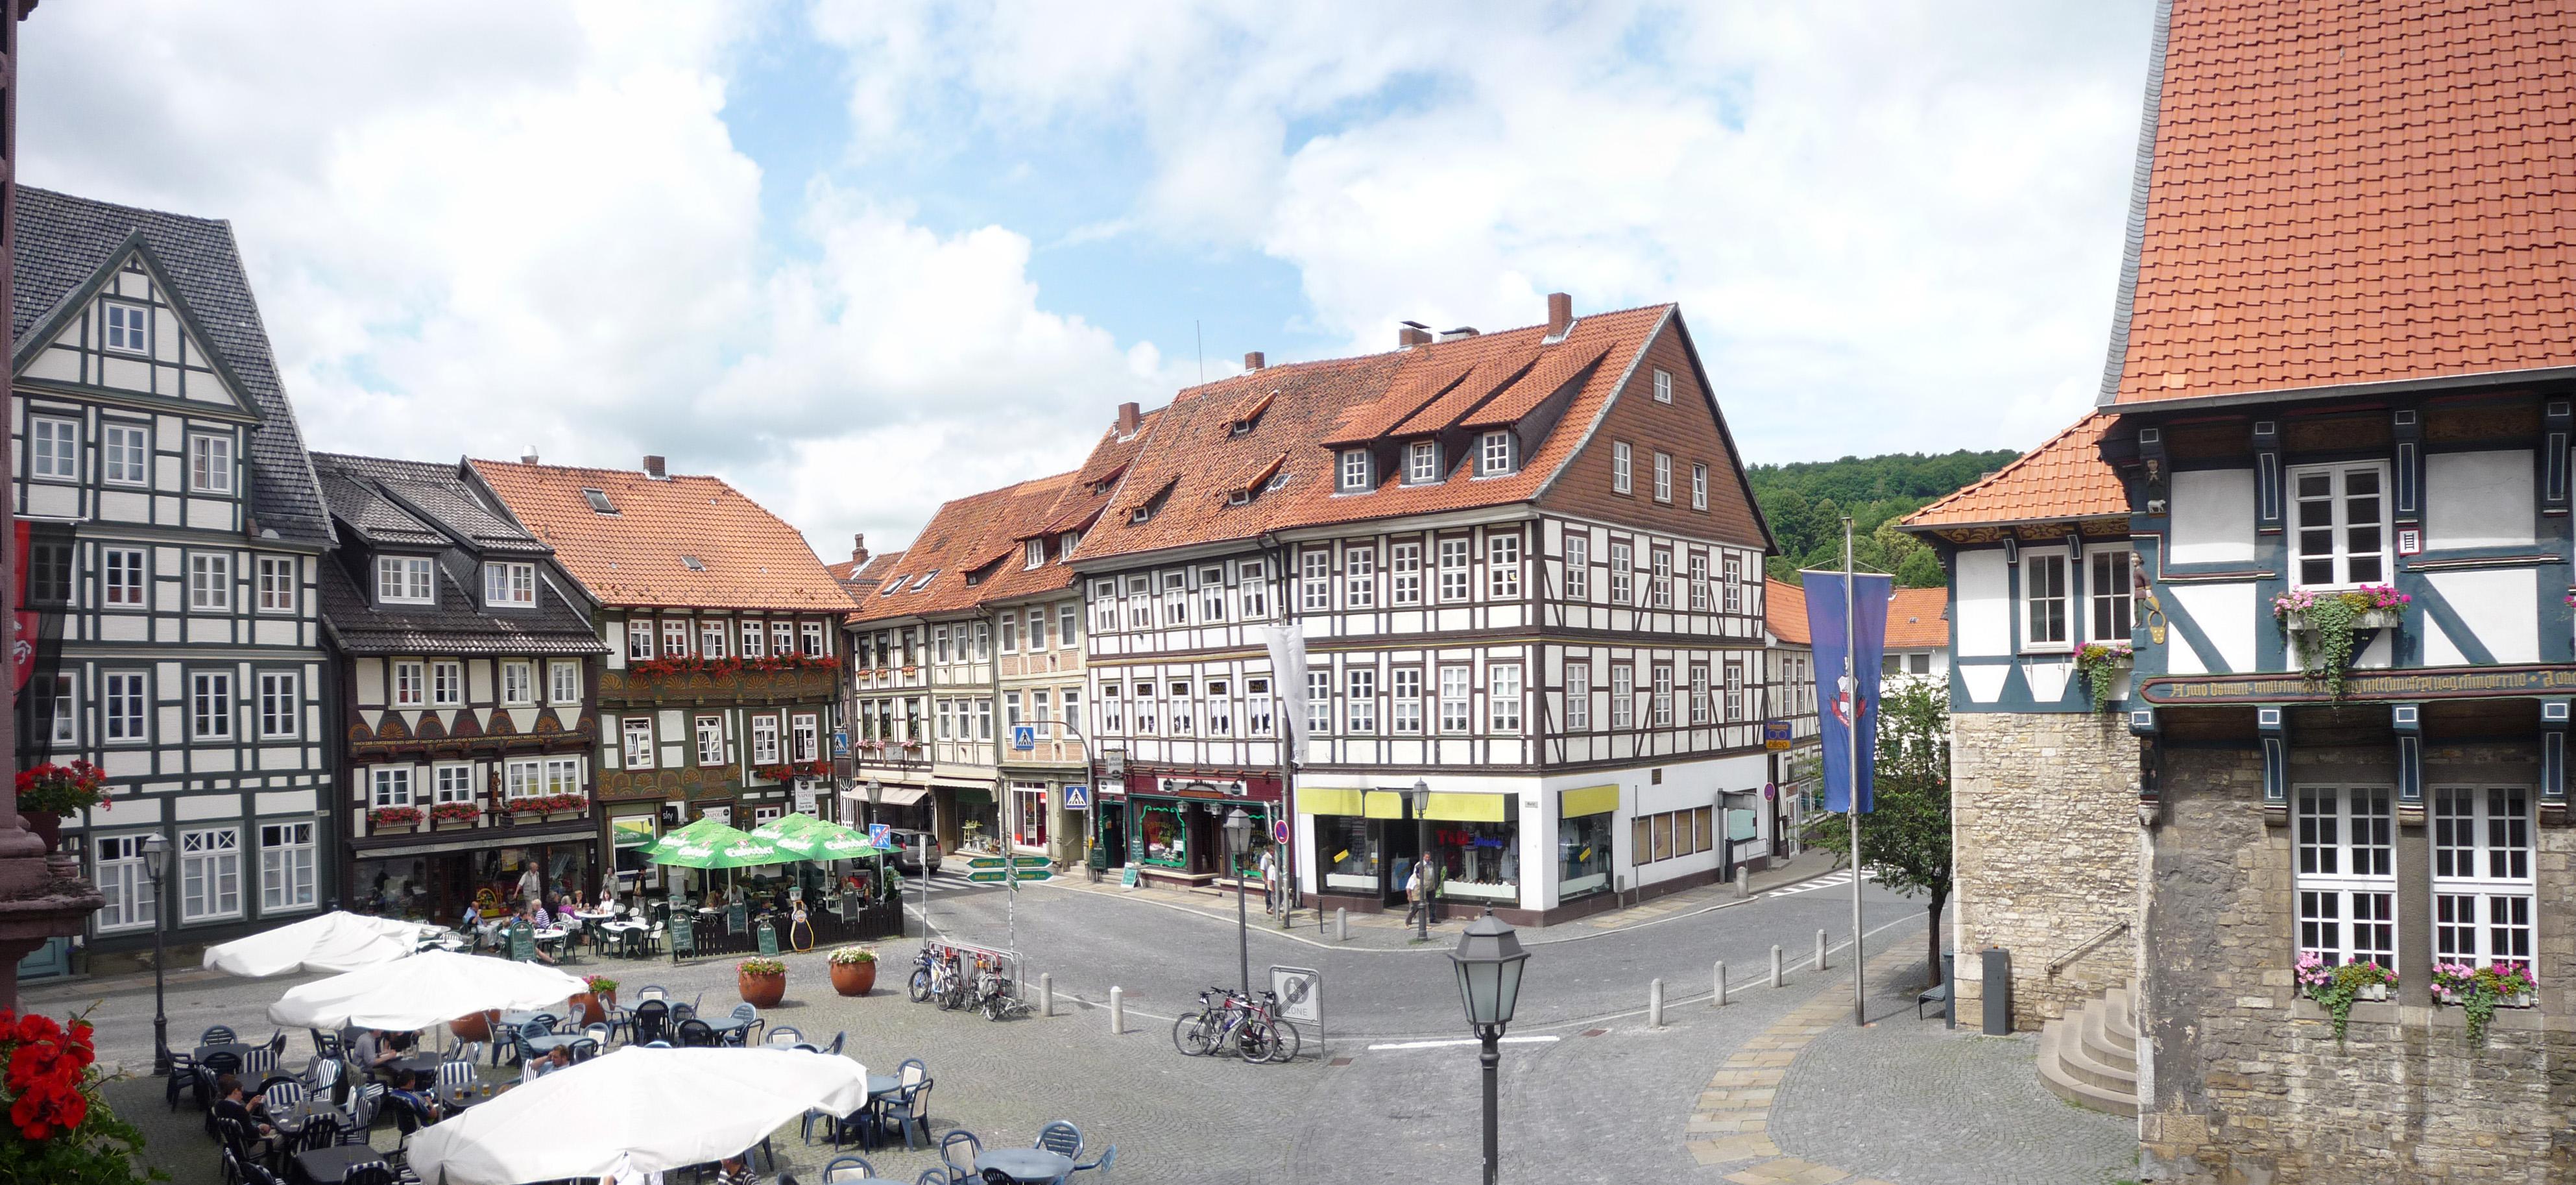 Hotel Bad Gandersheim  Bis  September  Person